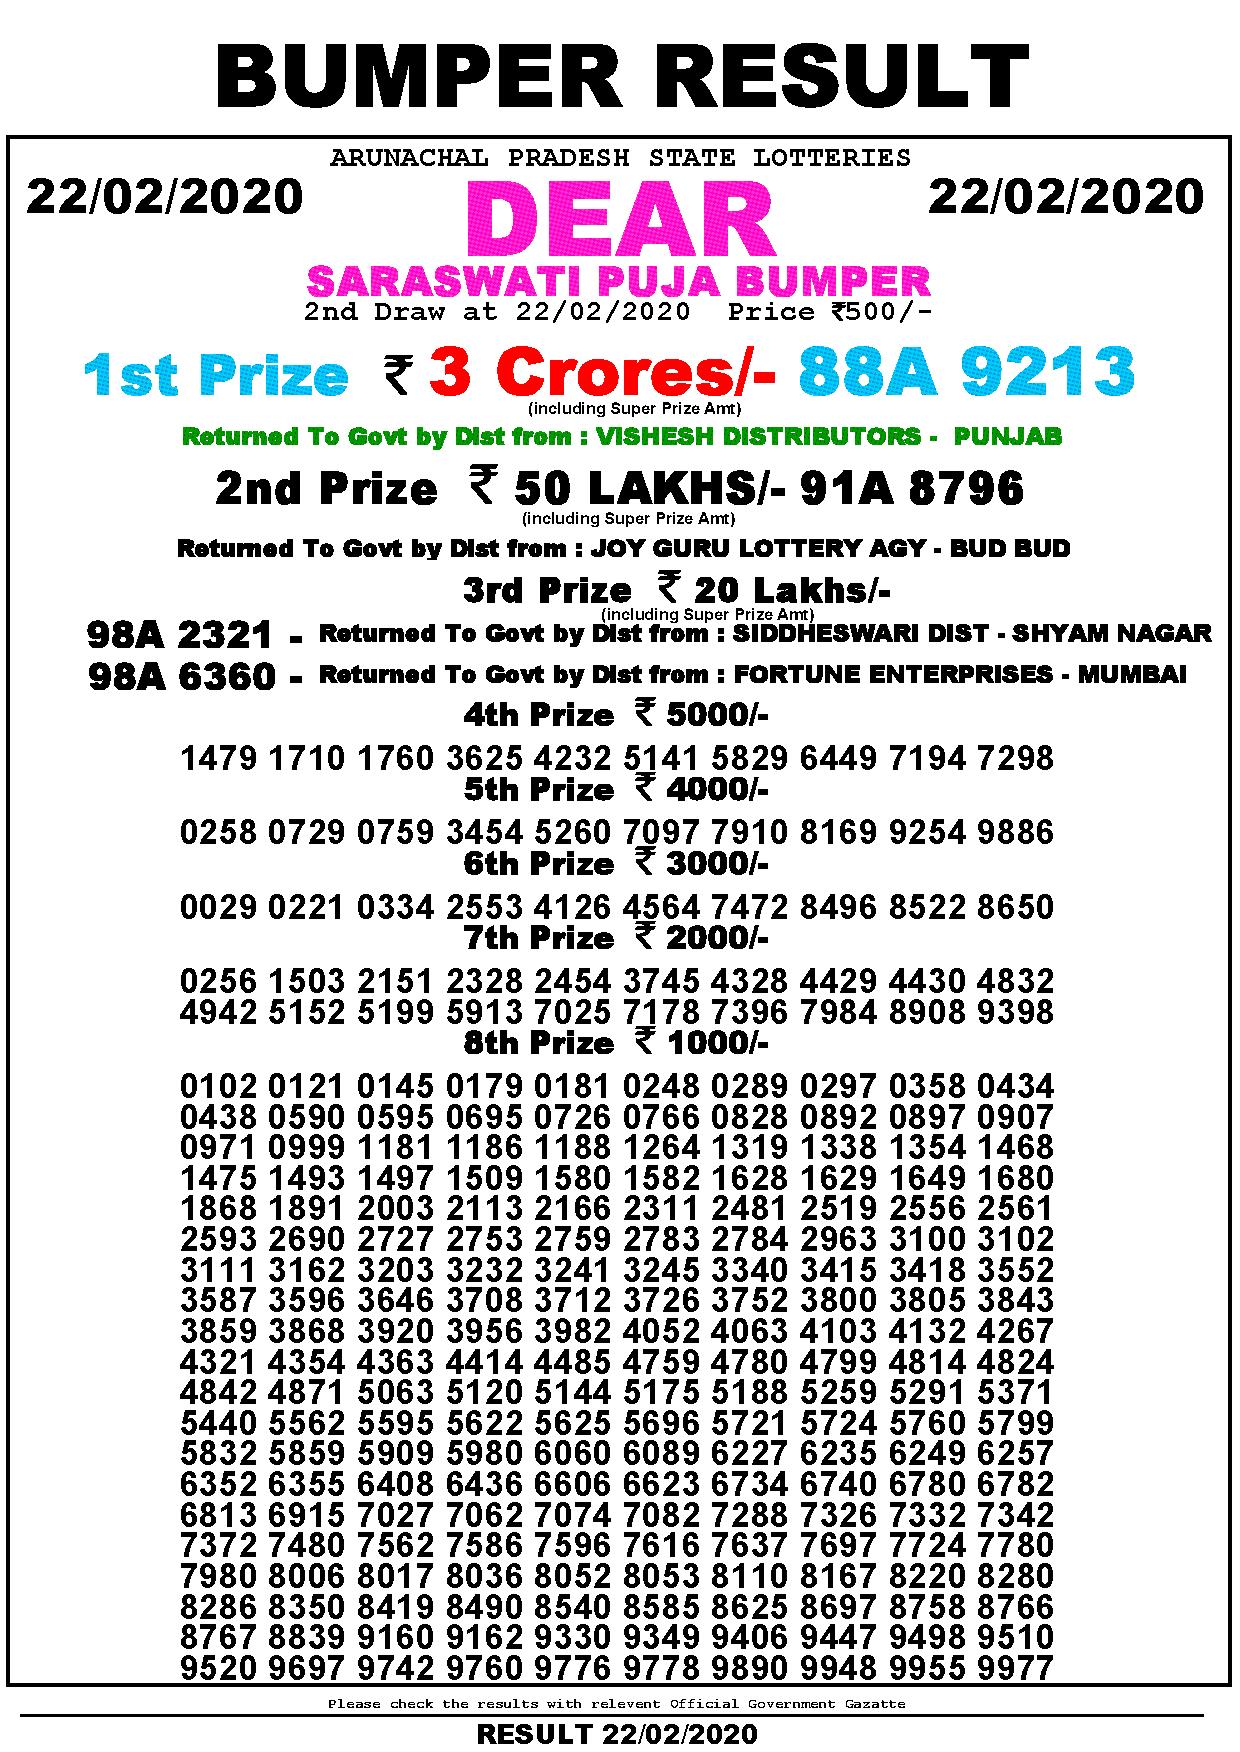 dear saraswati puja bumber 2020 result lottery baba